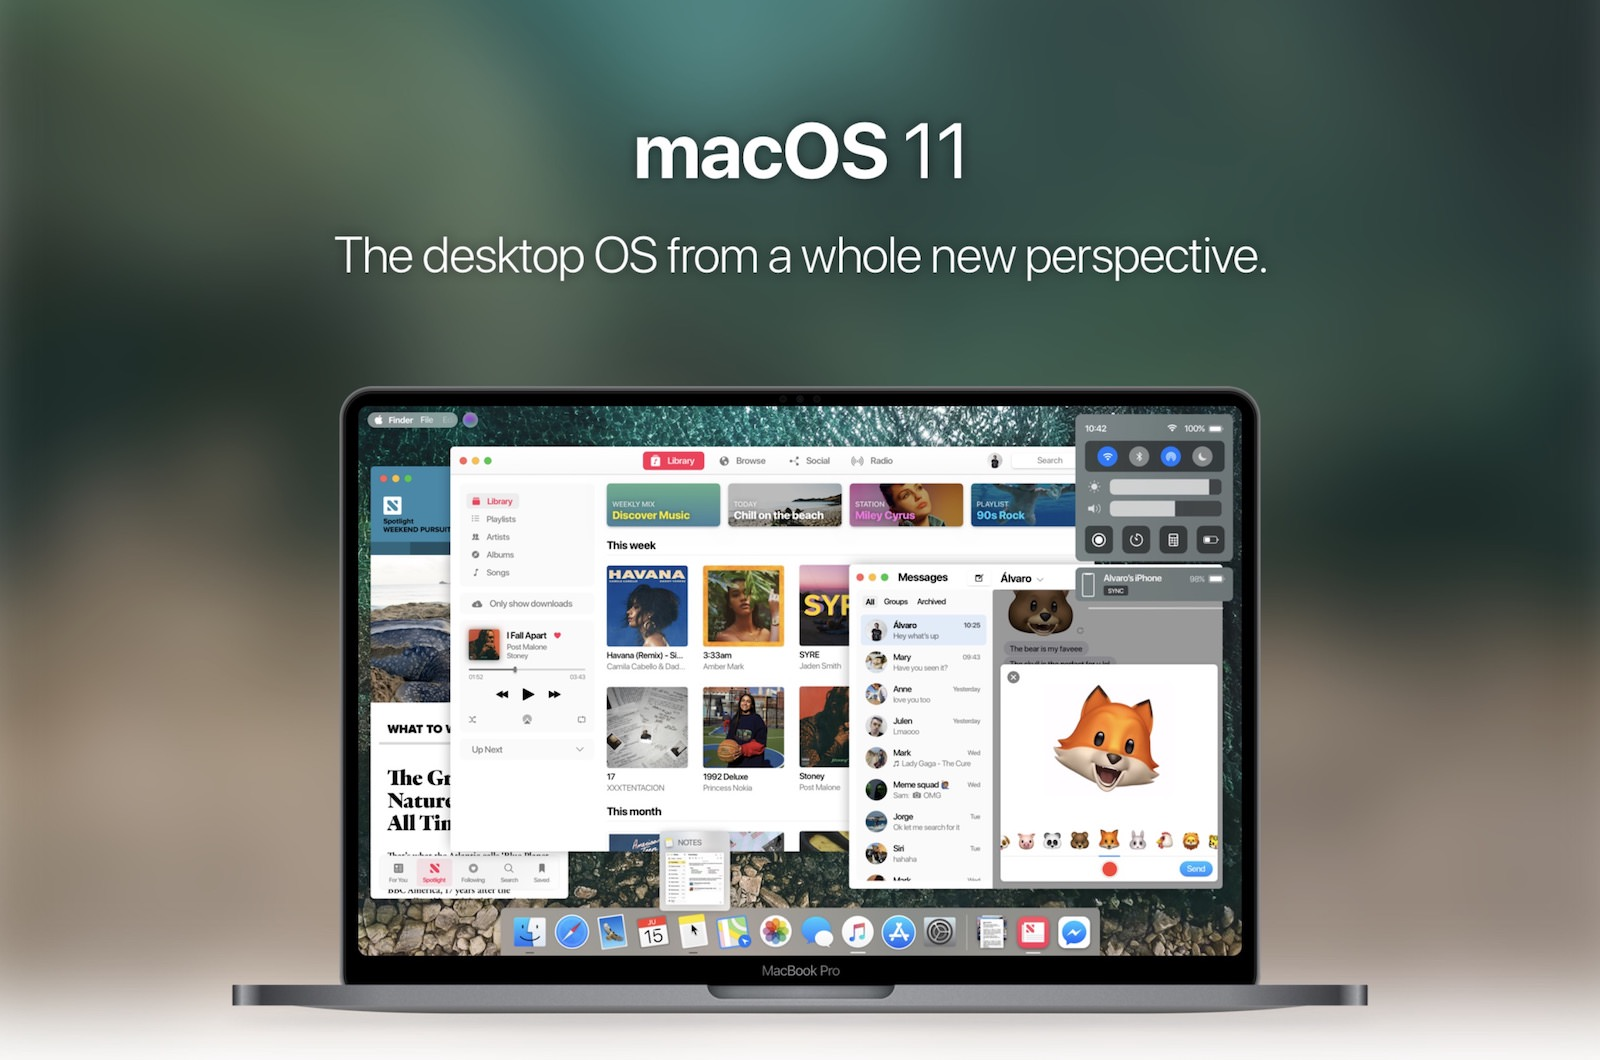 macOS-11-concdpt-image.jpg